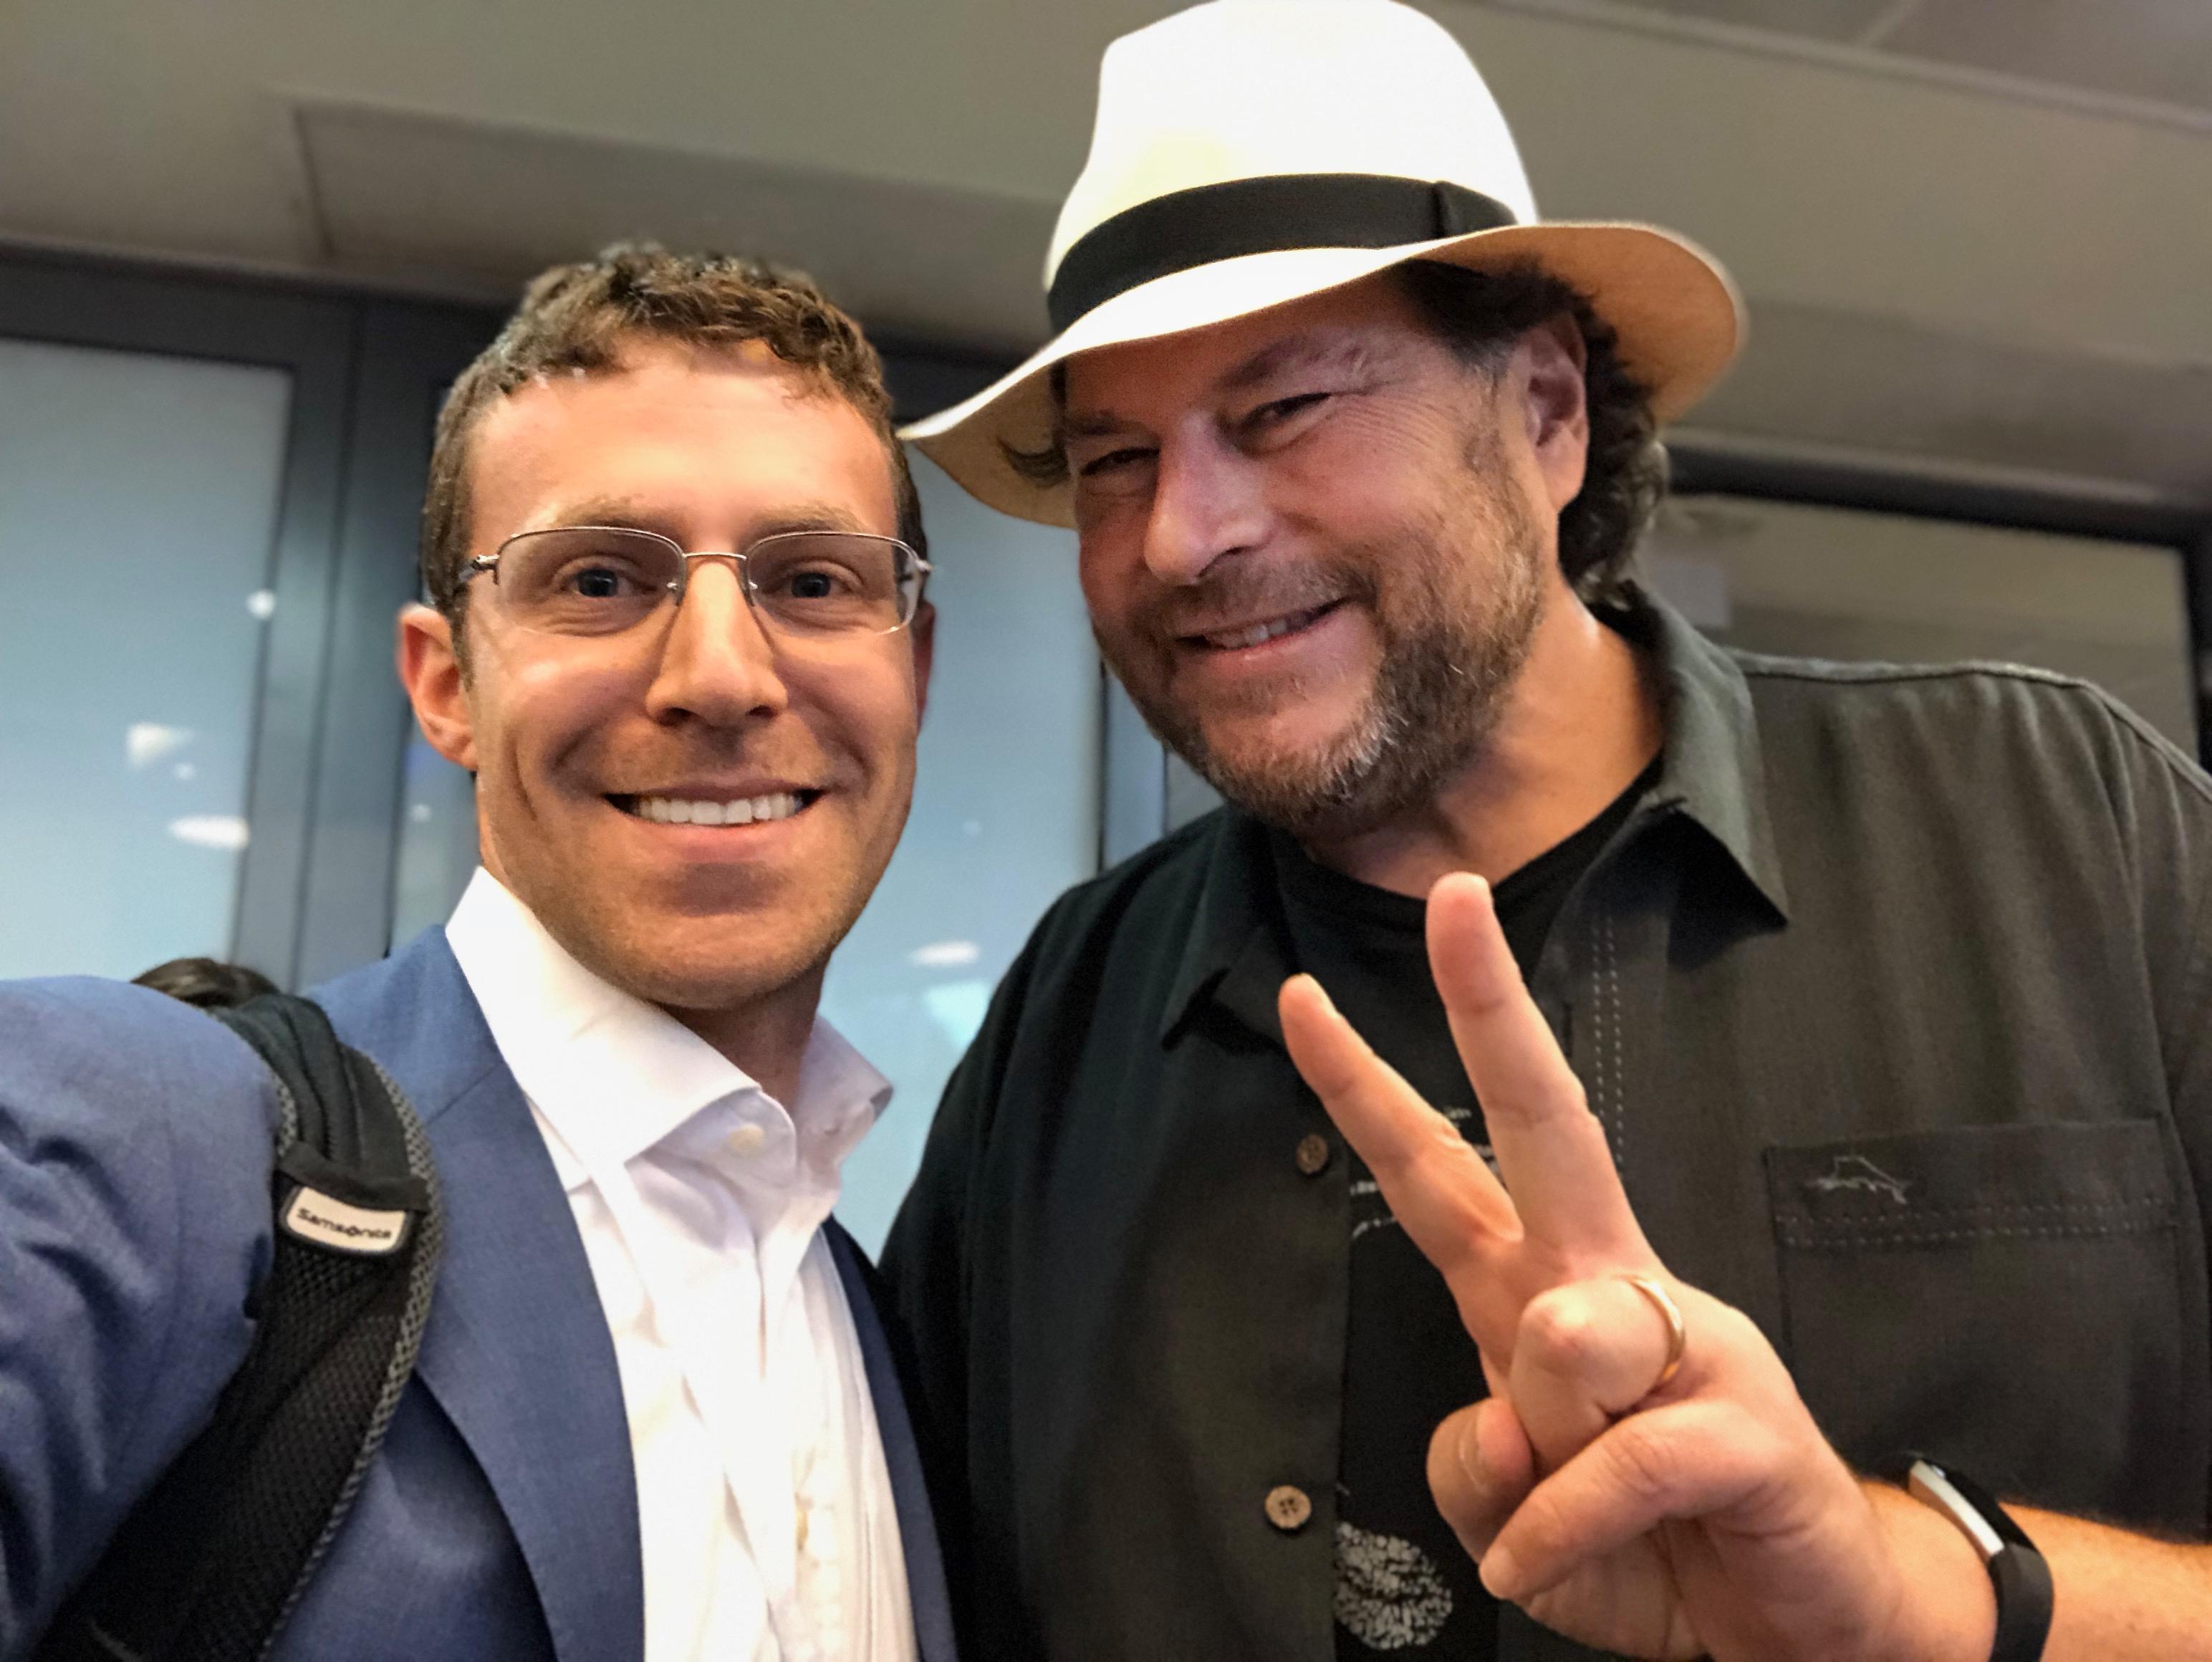 Elan Mosbacher, Marc Benioff, Salesforce CEO